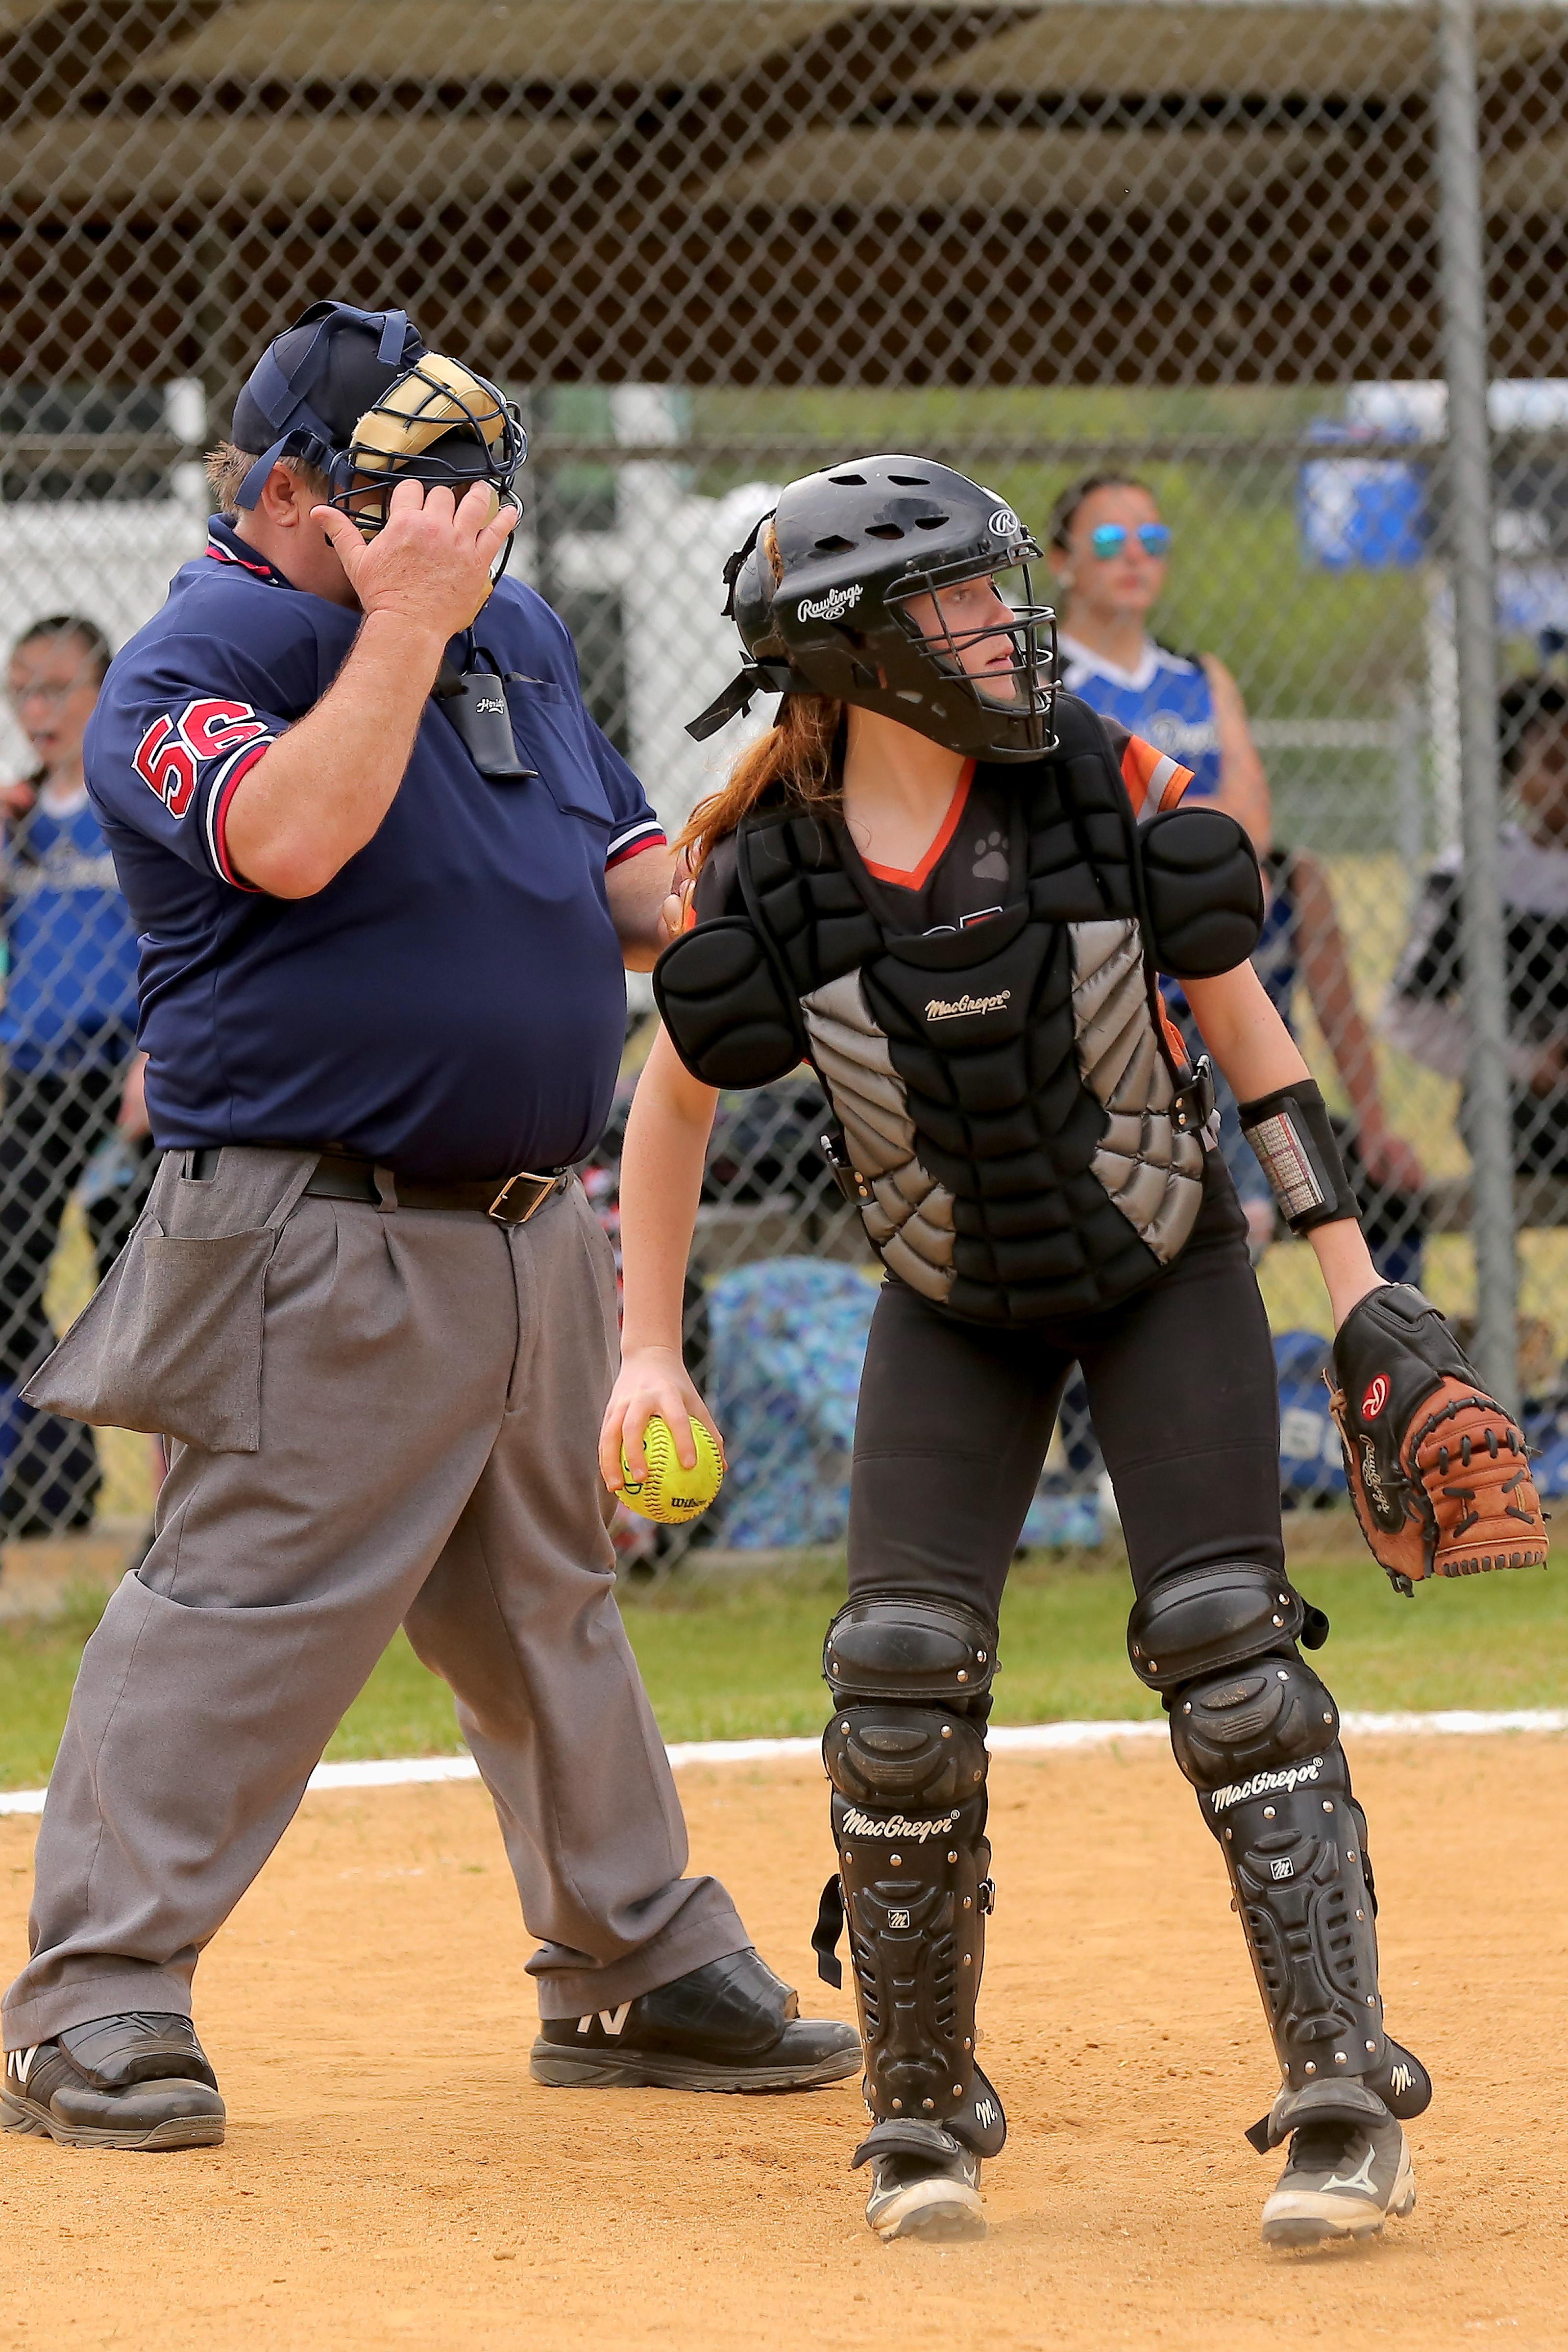 ELizabethtown vs clarkton softball